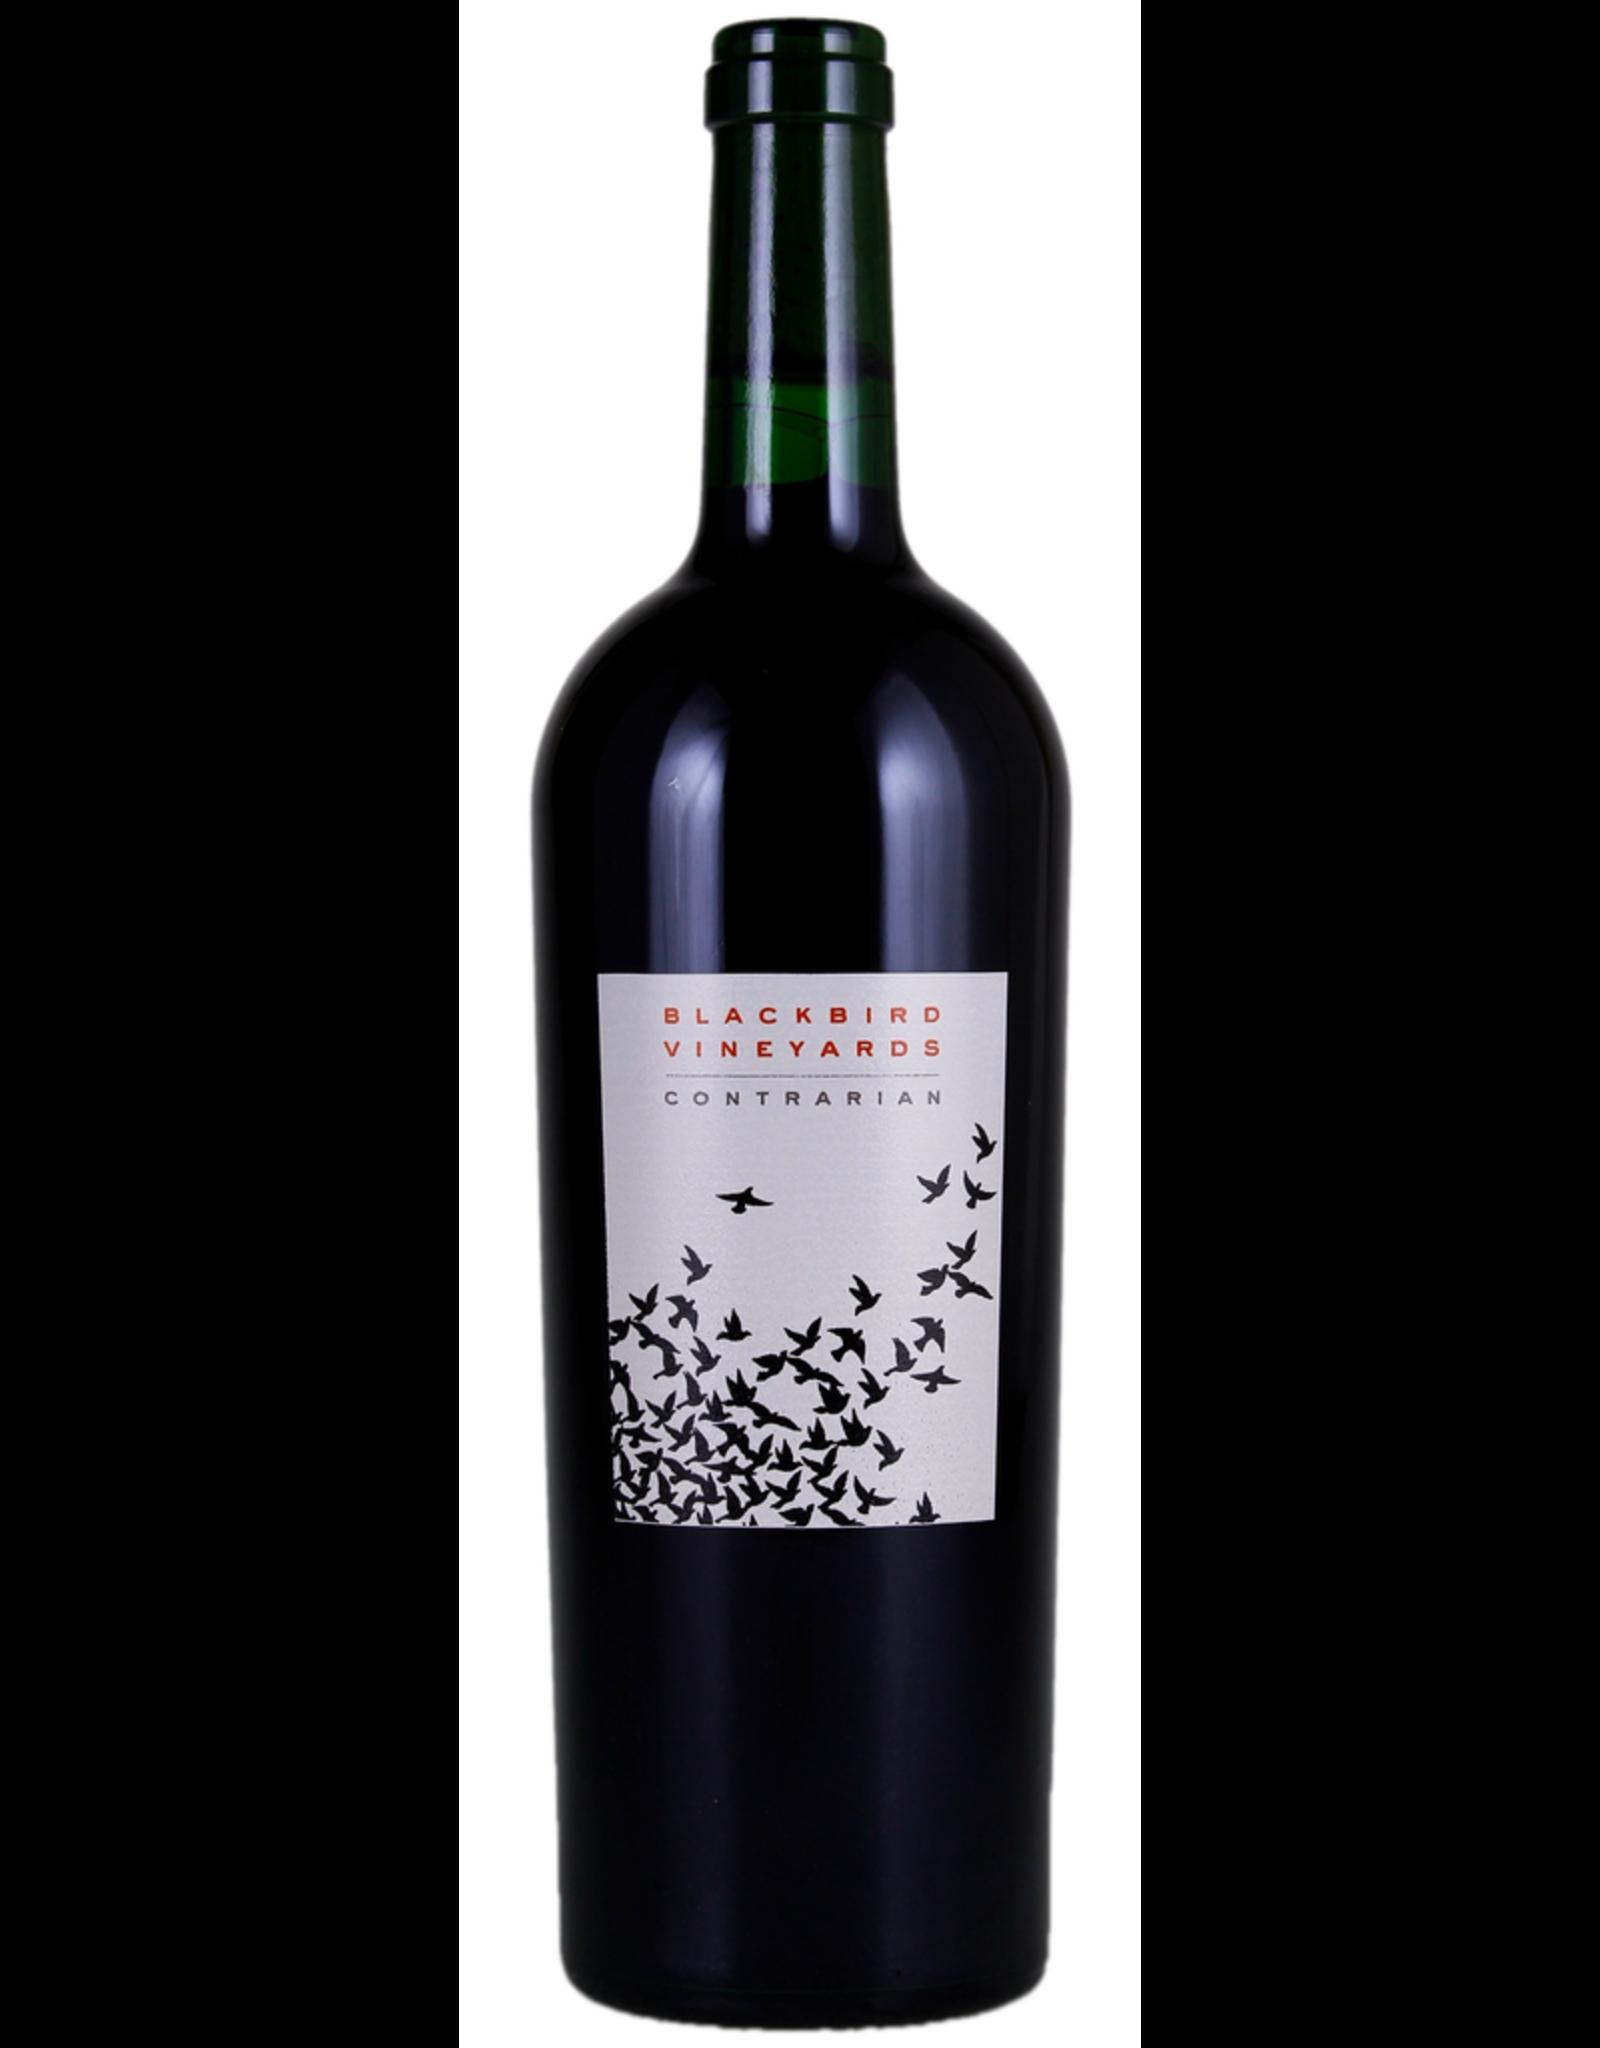 Red Wine 2014, Blackbird Vineyards Contrarian, Red Bordeaux Blend, Oak Knoll, Napa Valley, California, 14% Alc, CTnr